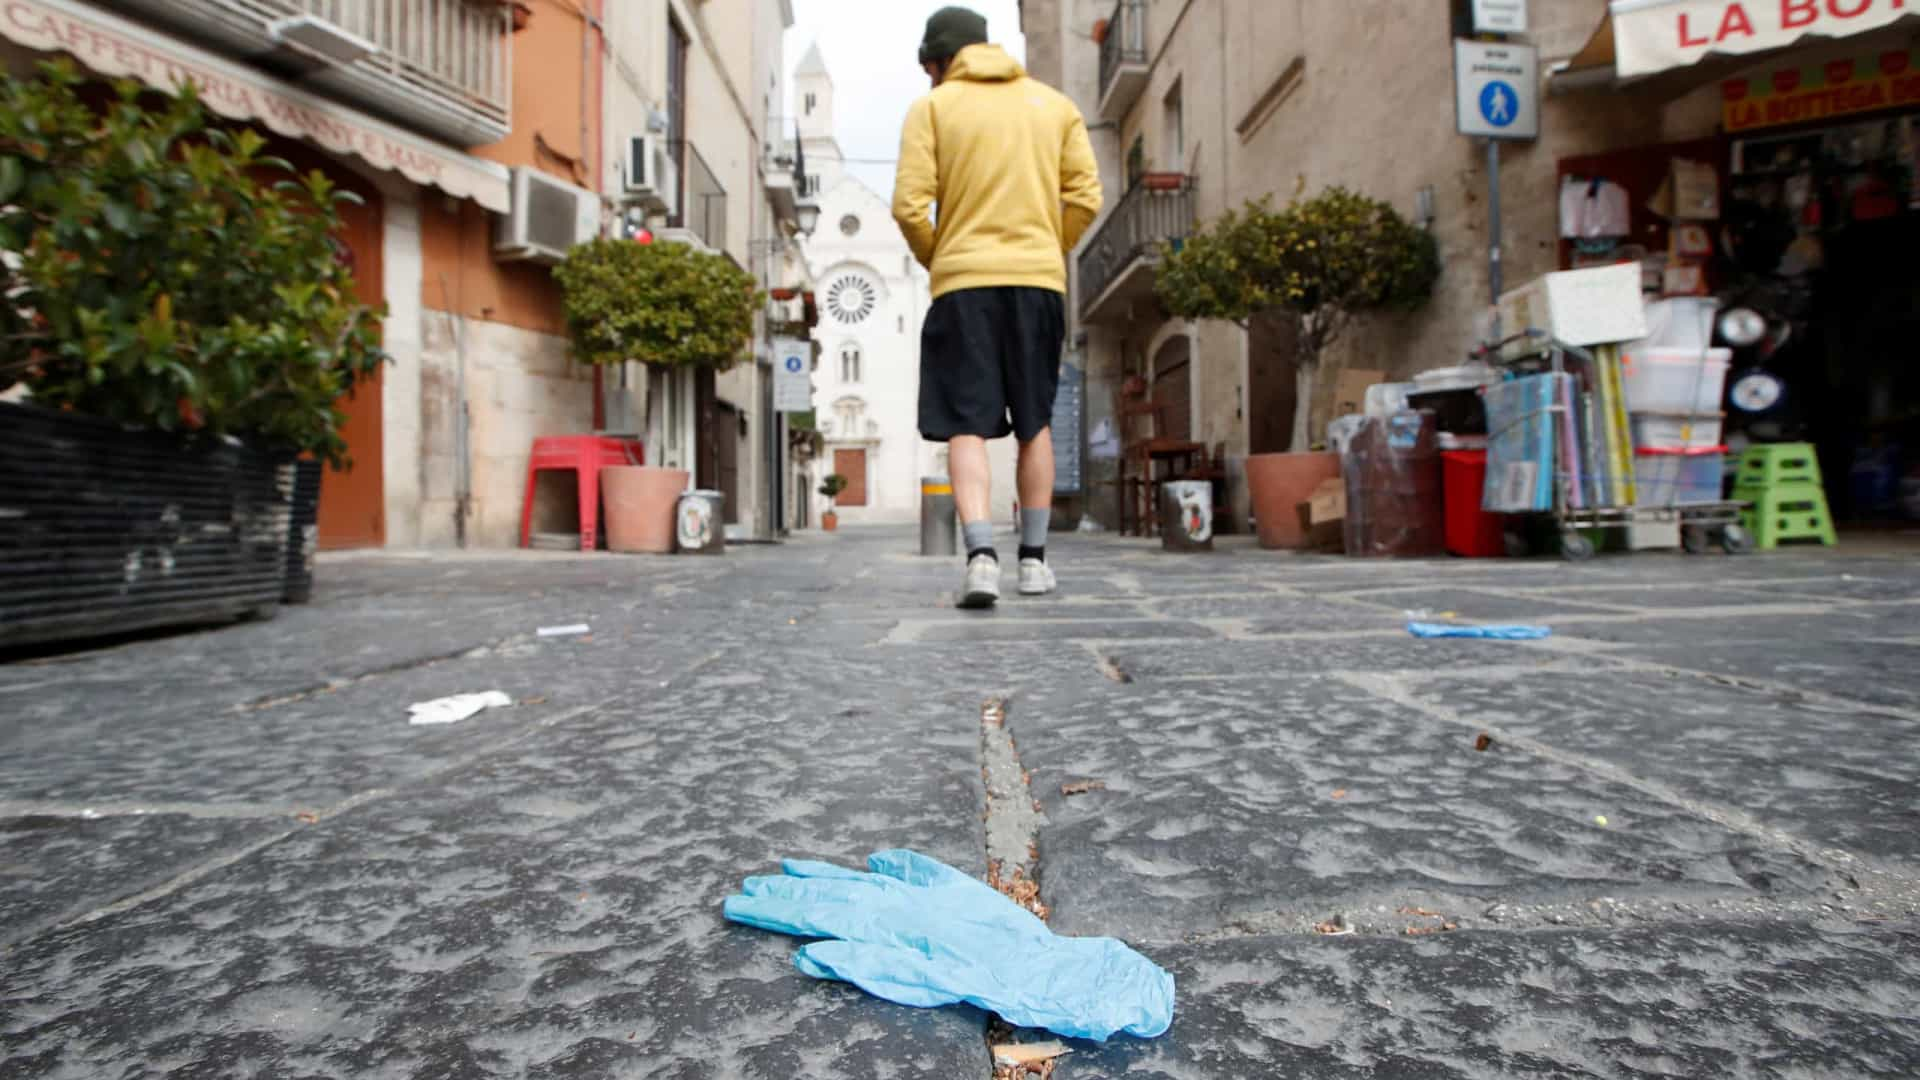 Itália muda as regras e autoriza menores a sair de casa